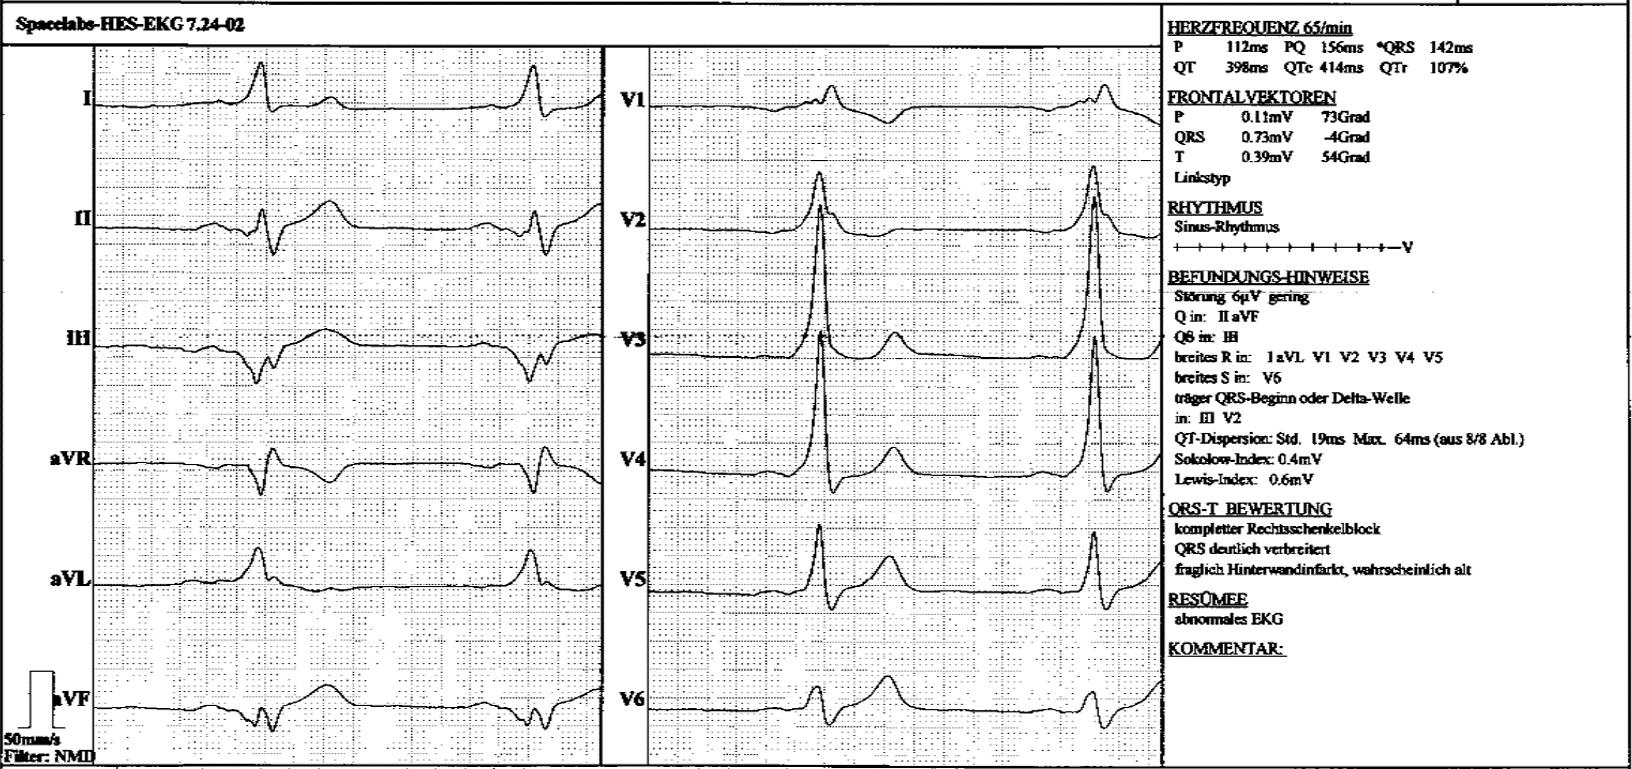 Av Reentry Tachykardie Und Ventrikuläre Präexzitation Wpw Syndrom